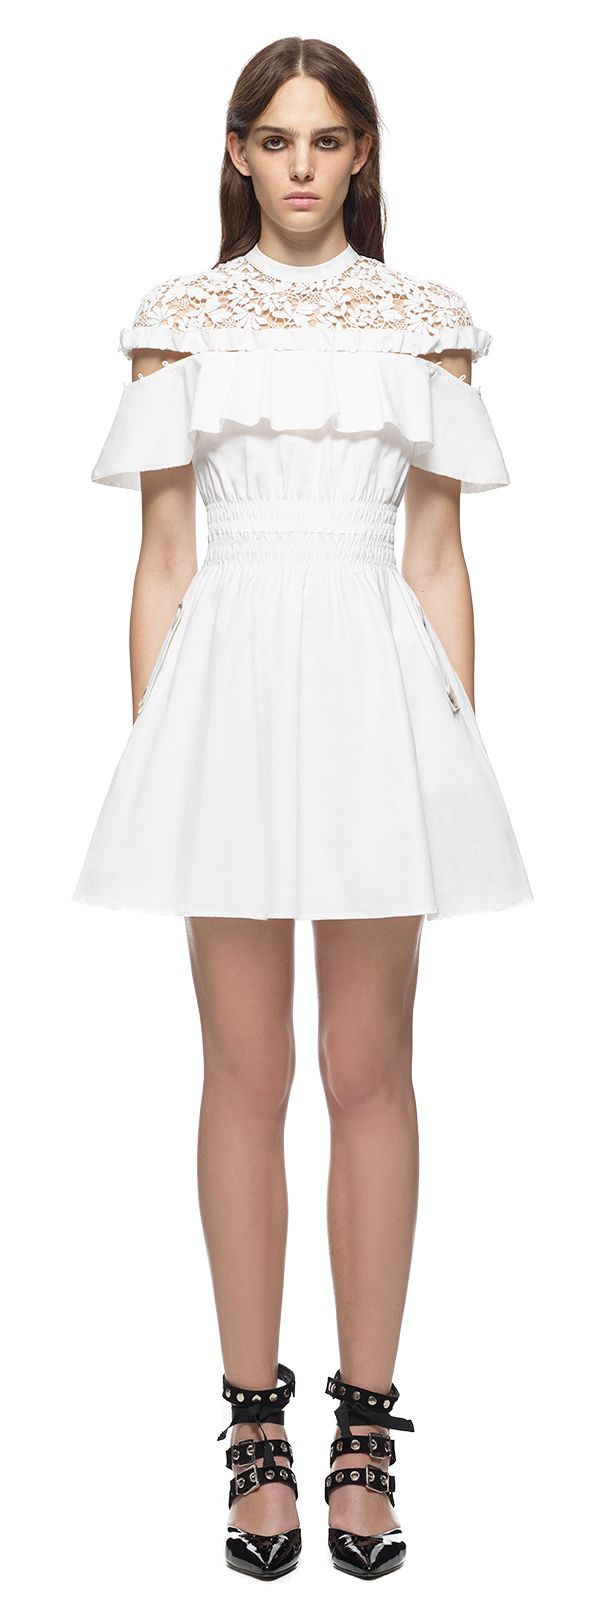 Customer login dresses pinterest mini dresses minis and